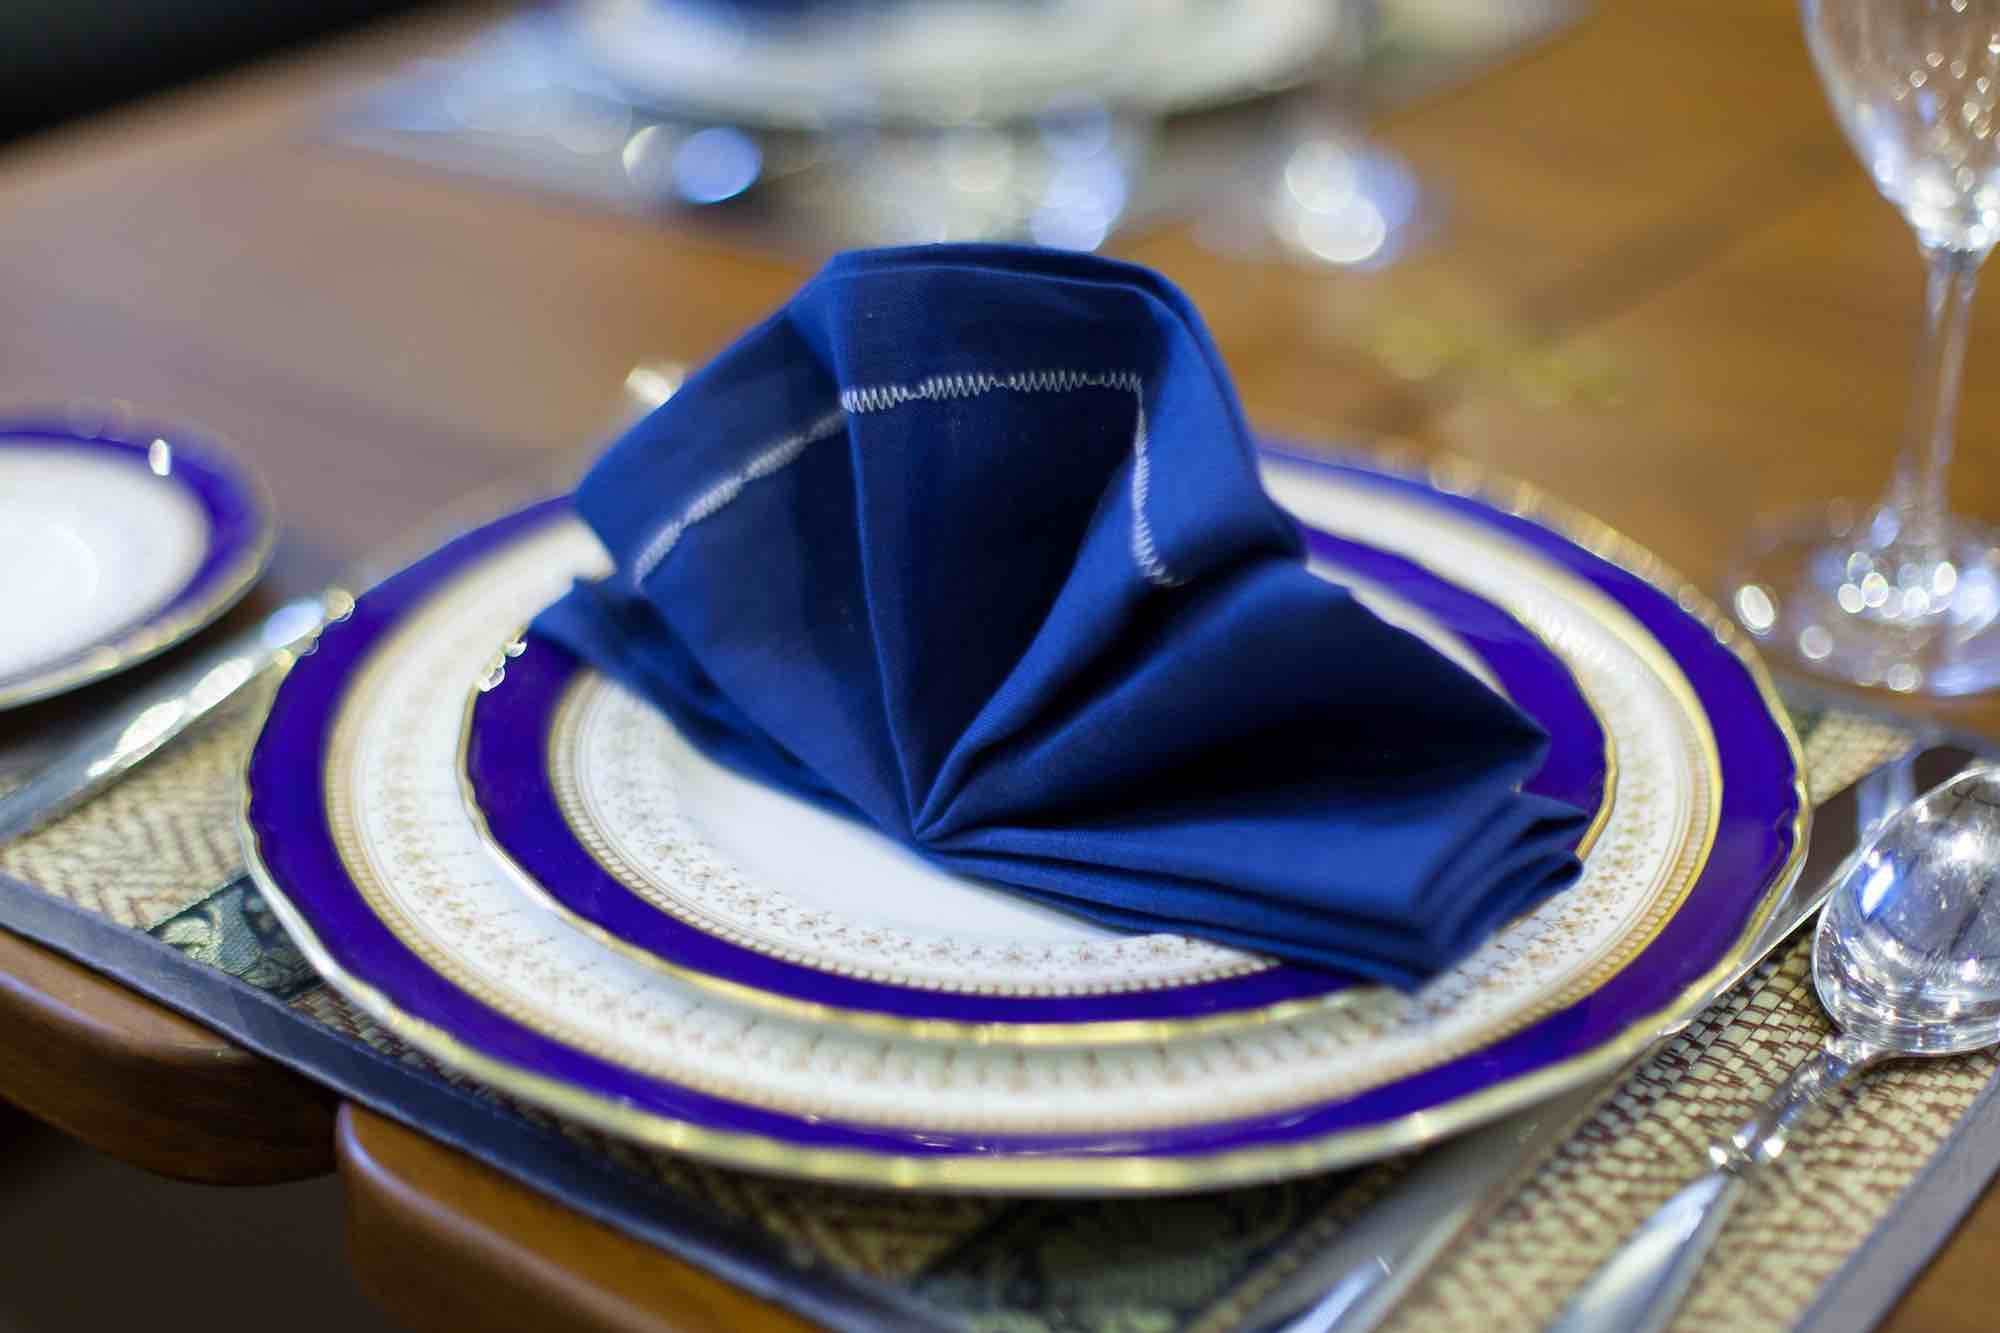 Dallinghoo_close-up of beautifully set dinner plate yacht holiday in Moken Archipelago 1_XS.jpeg